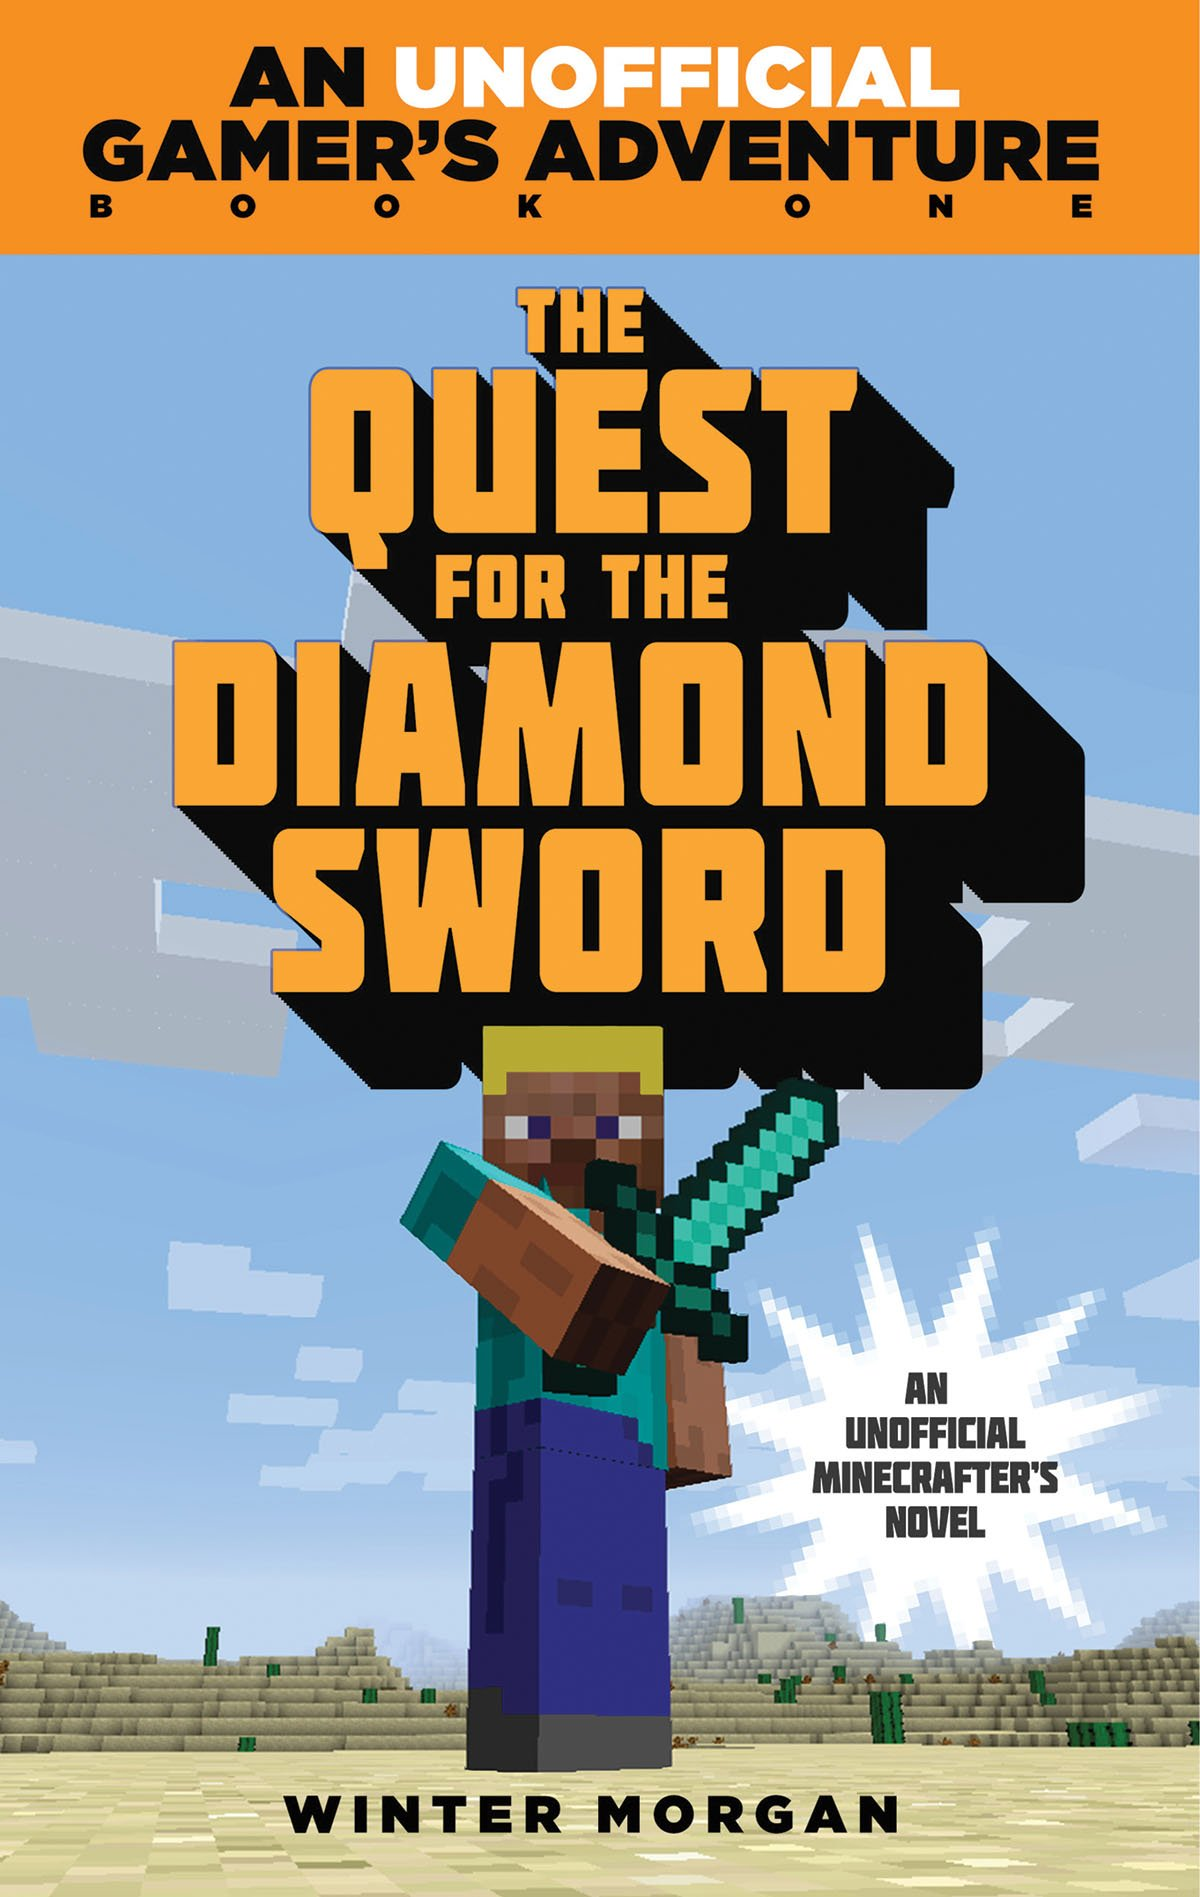 Quest Diamond Sword Unofficial Adventure product image